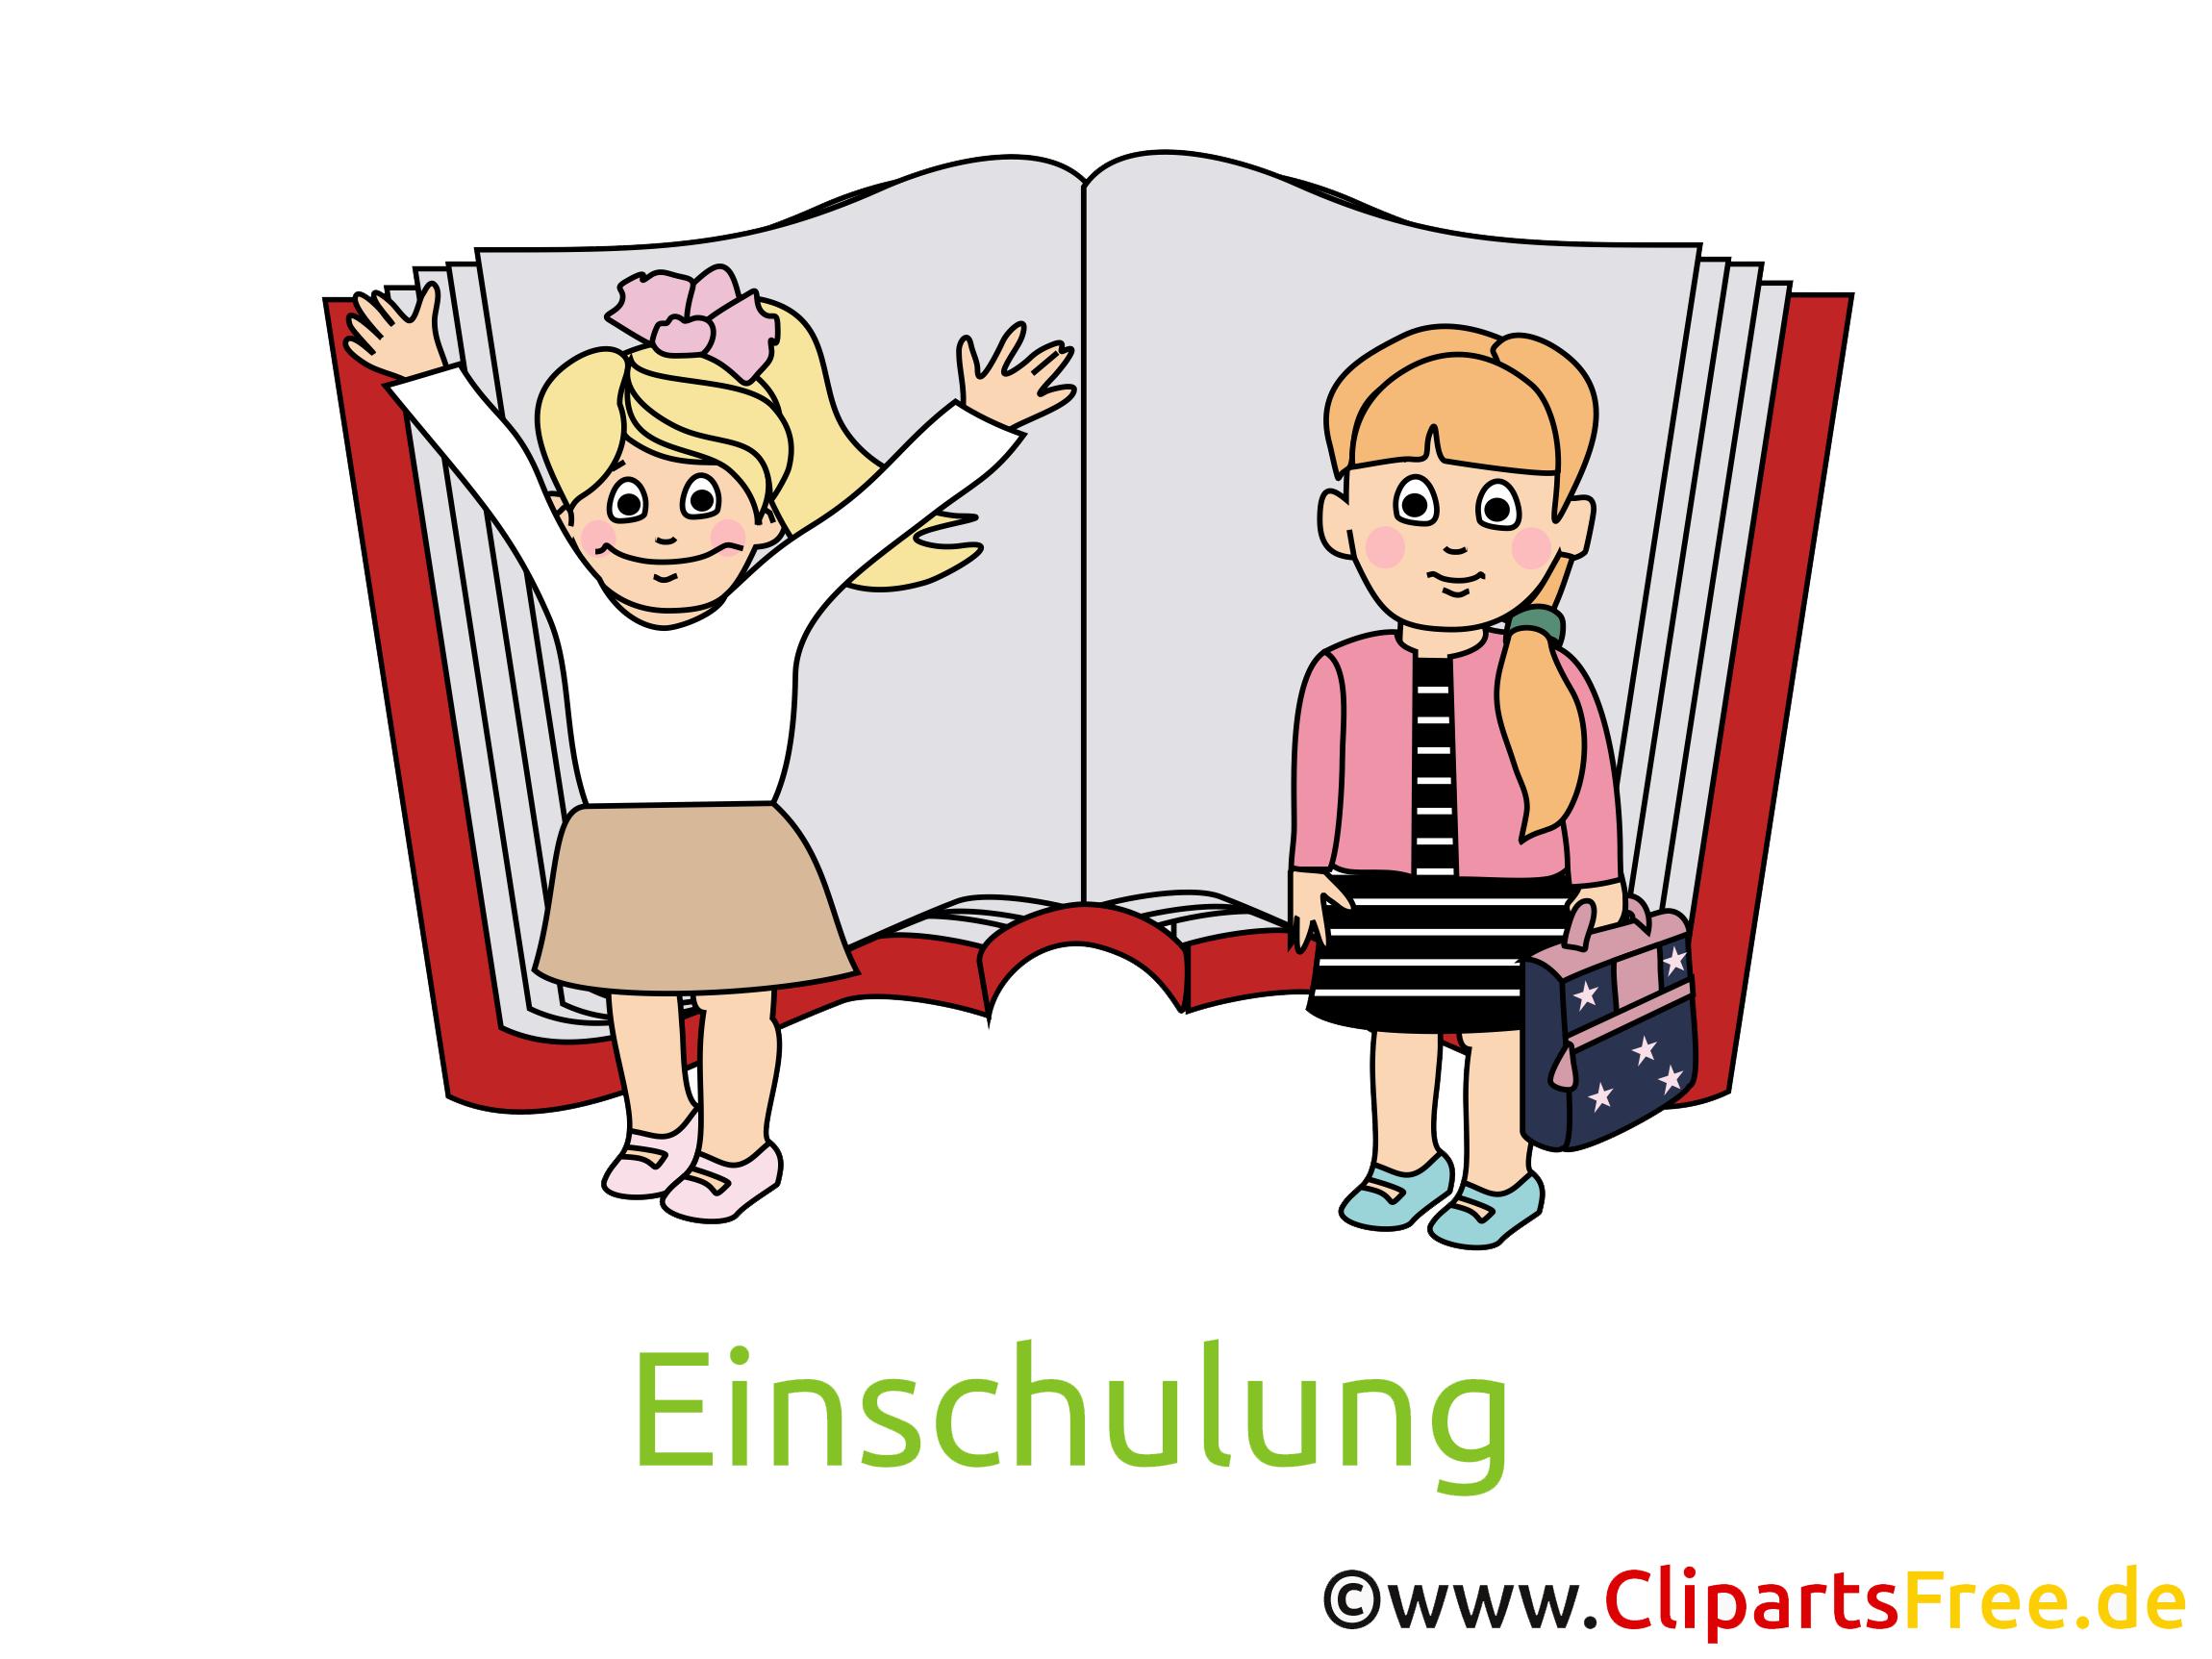 Cliparts Einschulung, Schulanfang kostenlos